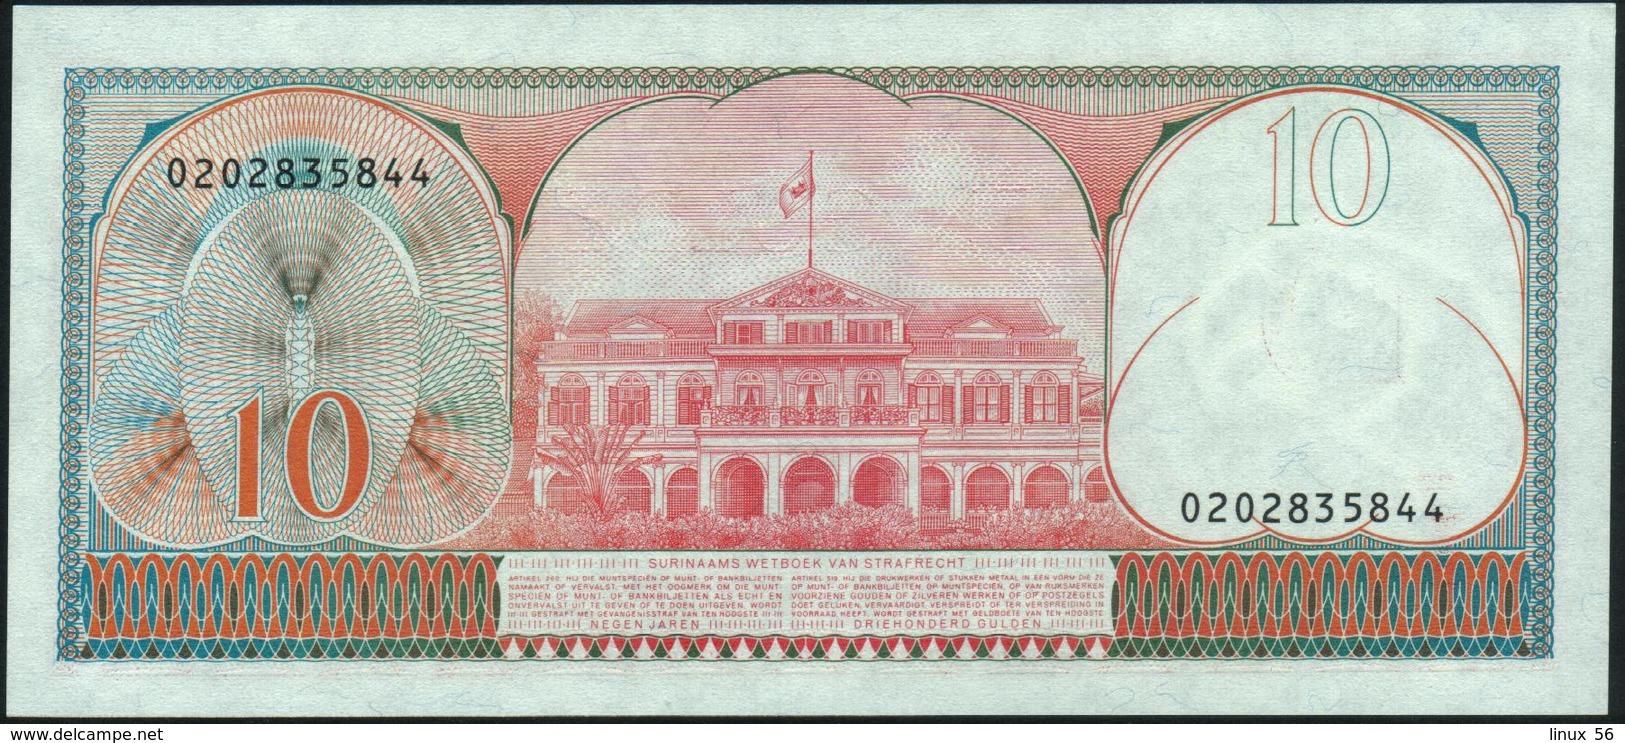 SURINAME - 10 Gulden 01.04.1982 AU-UNC P.126 - Surinam